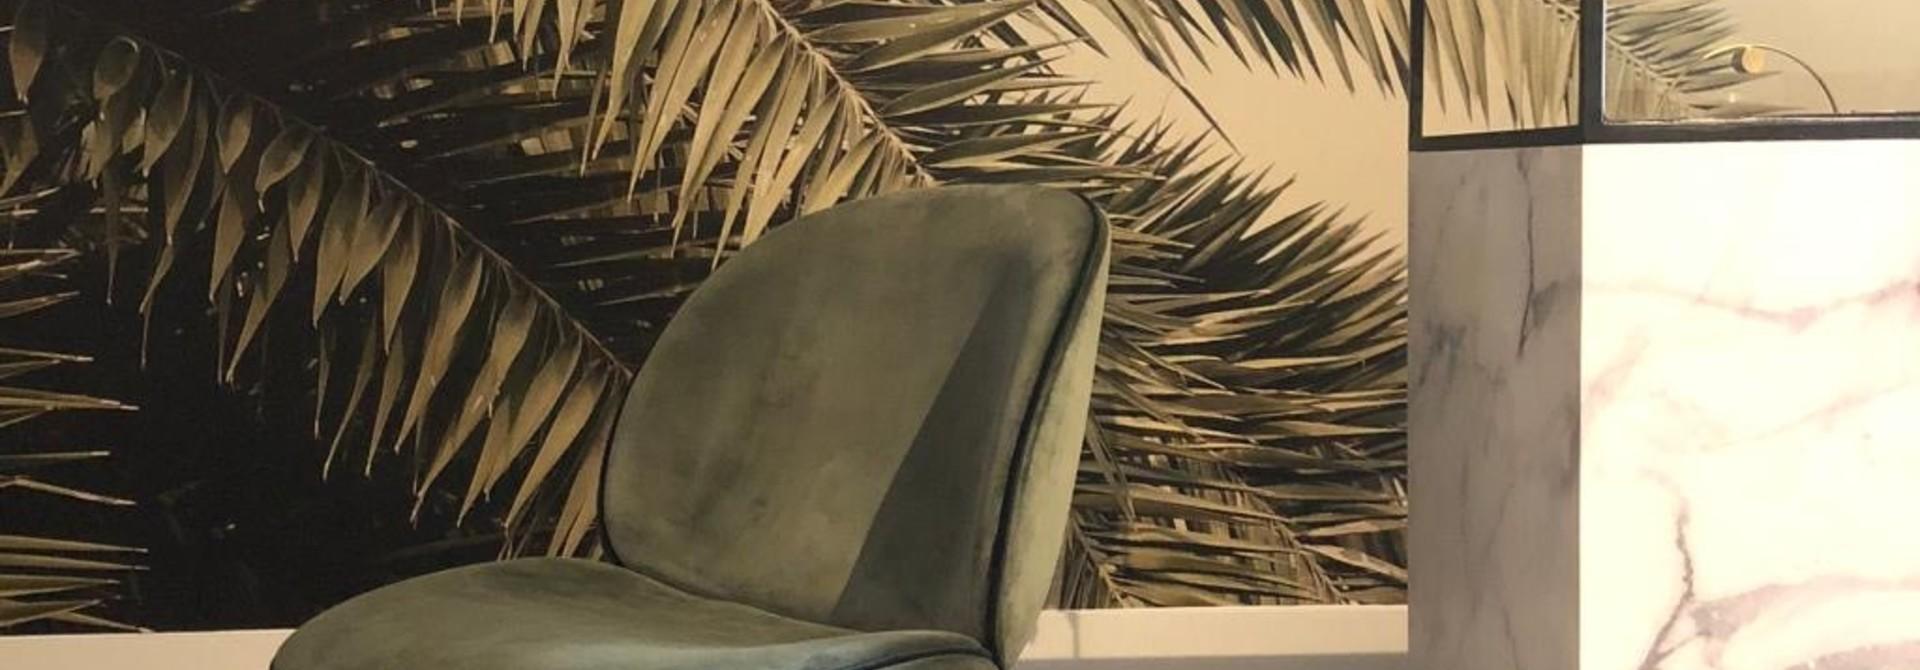 Beetle Lounge Chair Showroommodel